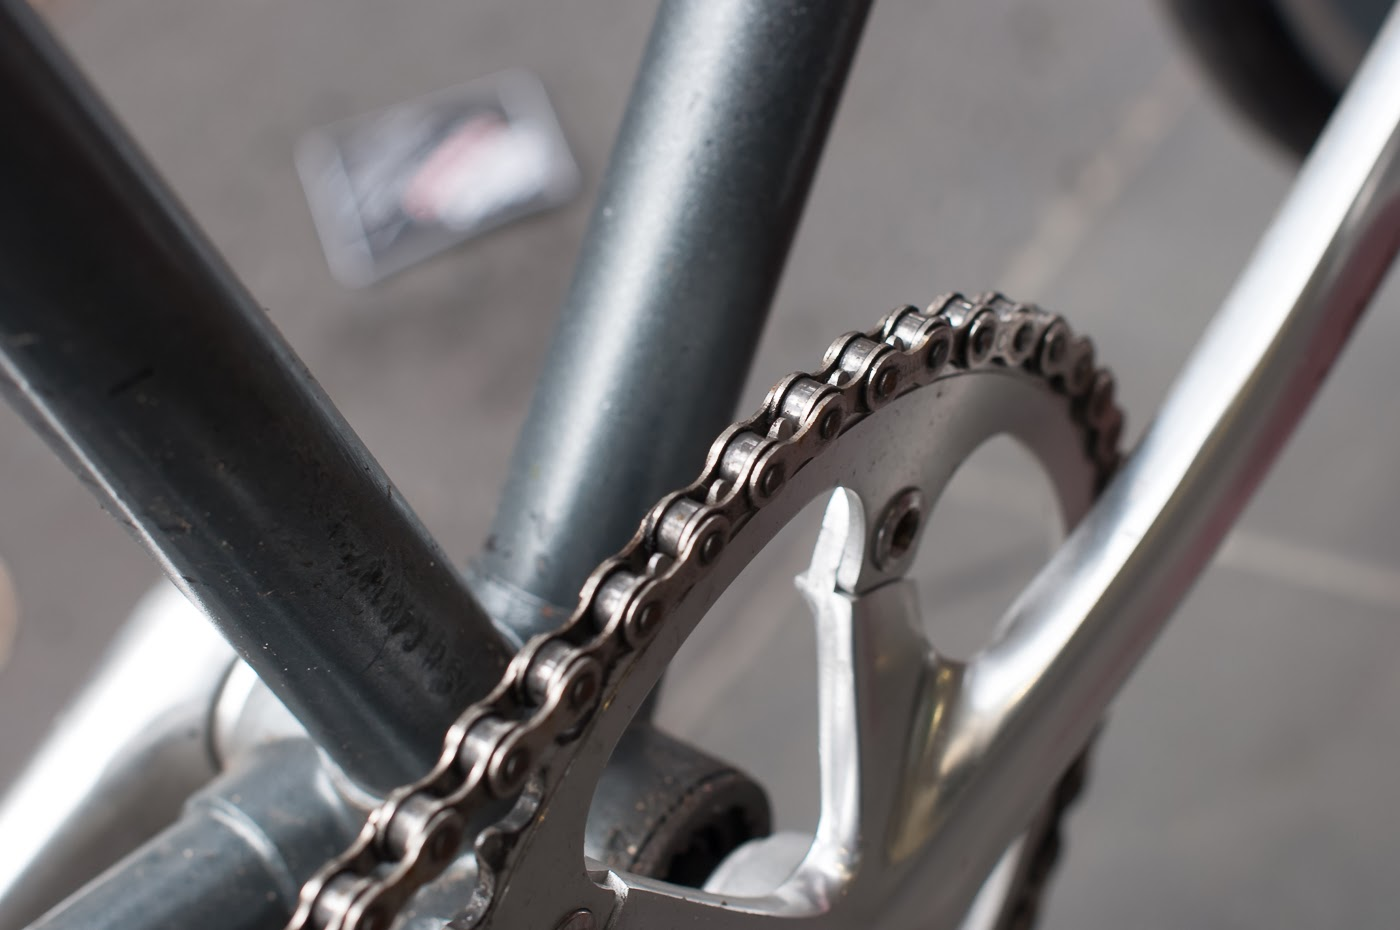 single speed, bike, bicycle, tim macauley, the biketorialist, melbourne, conversion, road bike, bourke st, custom, crank,